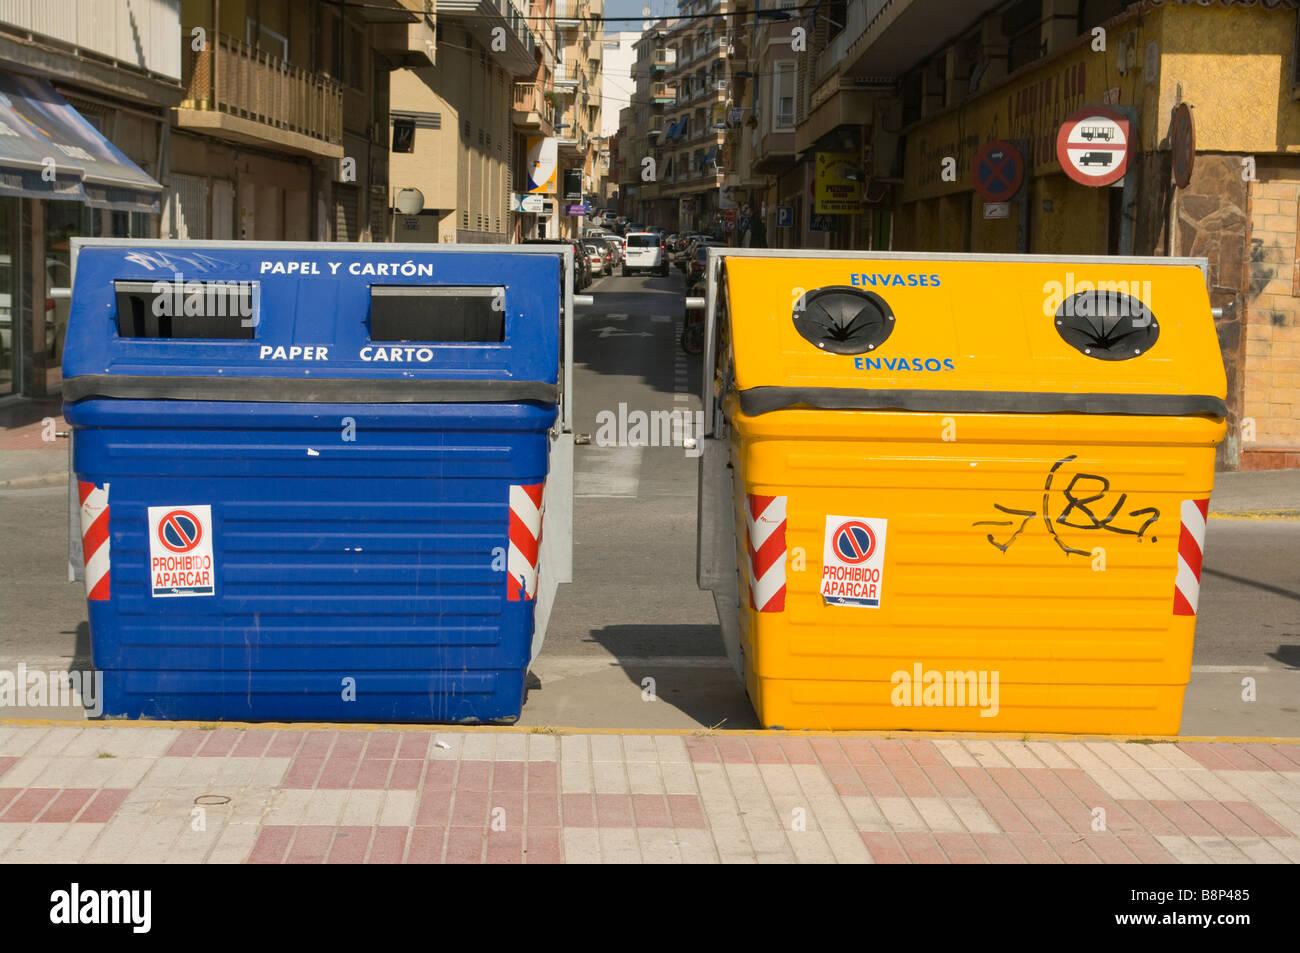 Spanish Recycling Bins Spain - Stock Image